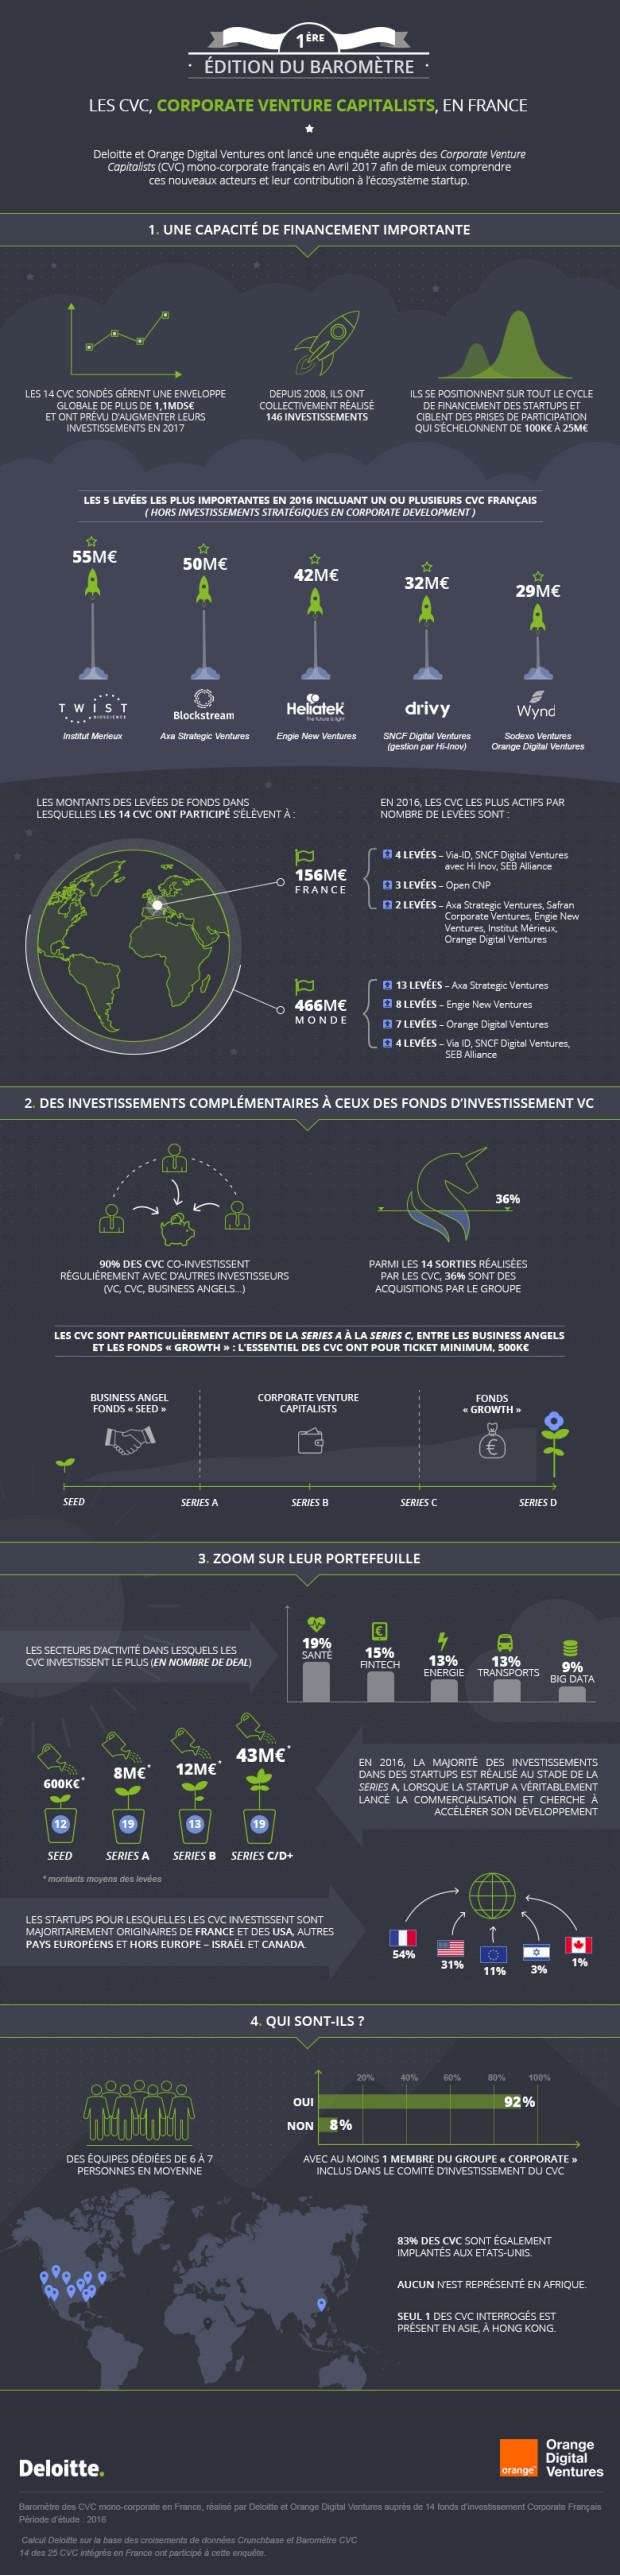 Deloitte infographie